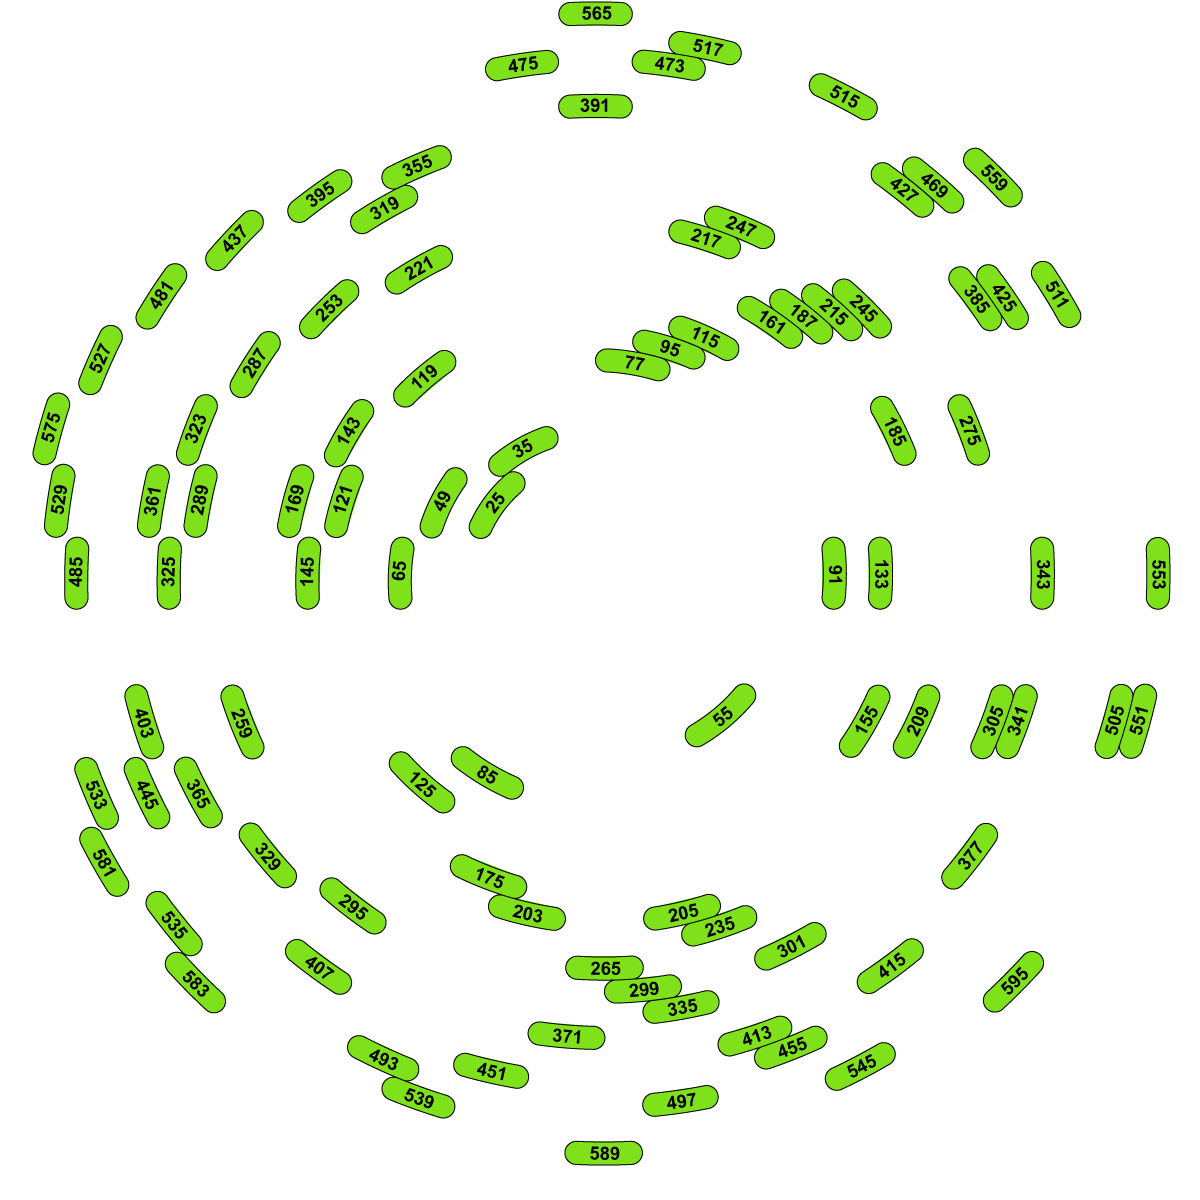 dipolar-spiral-layer4-2021